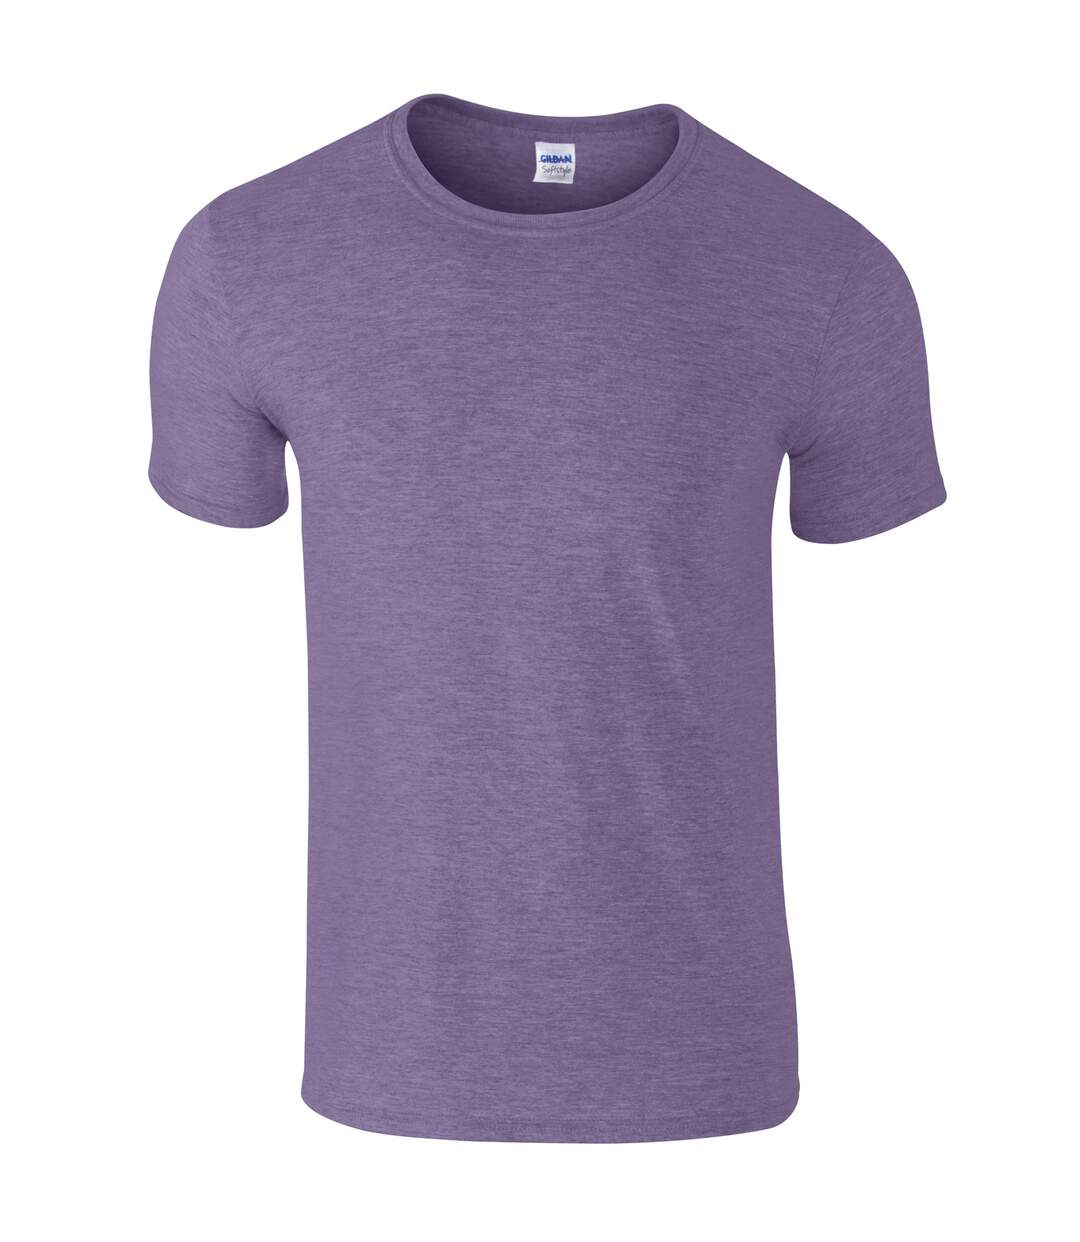 Gildan Mens Short Sleeve Soft-Style T-Shirt (Purple) - UTBC484